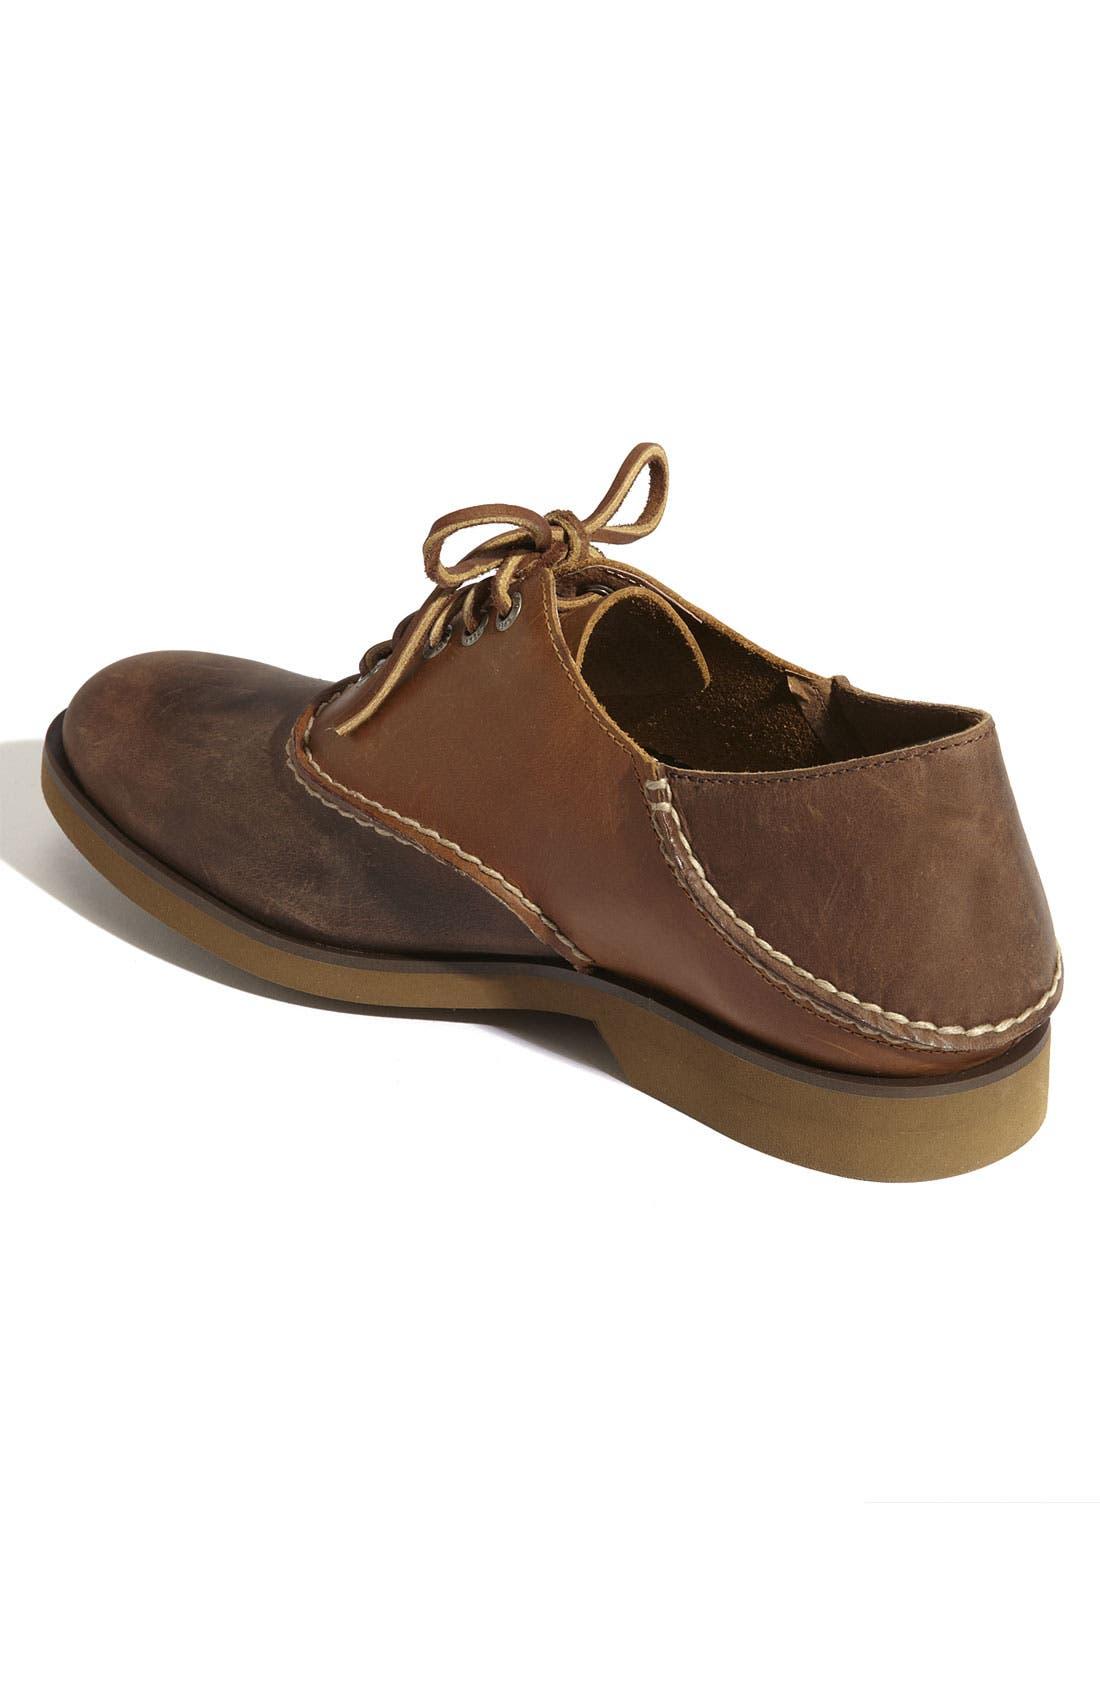 Alternate Image 2  - Sperry Top-Sider® 'Boat' Oxford Saddle Shoe